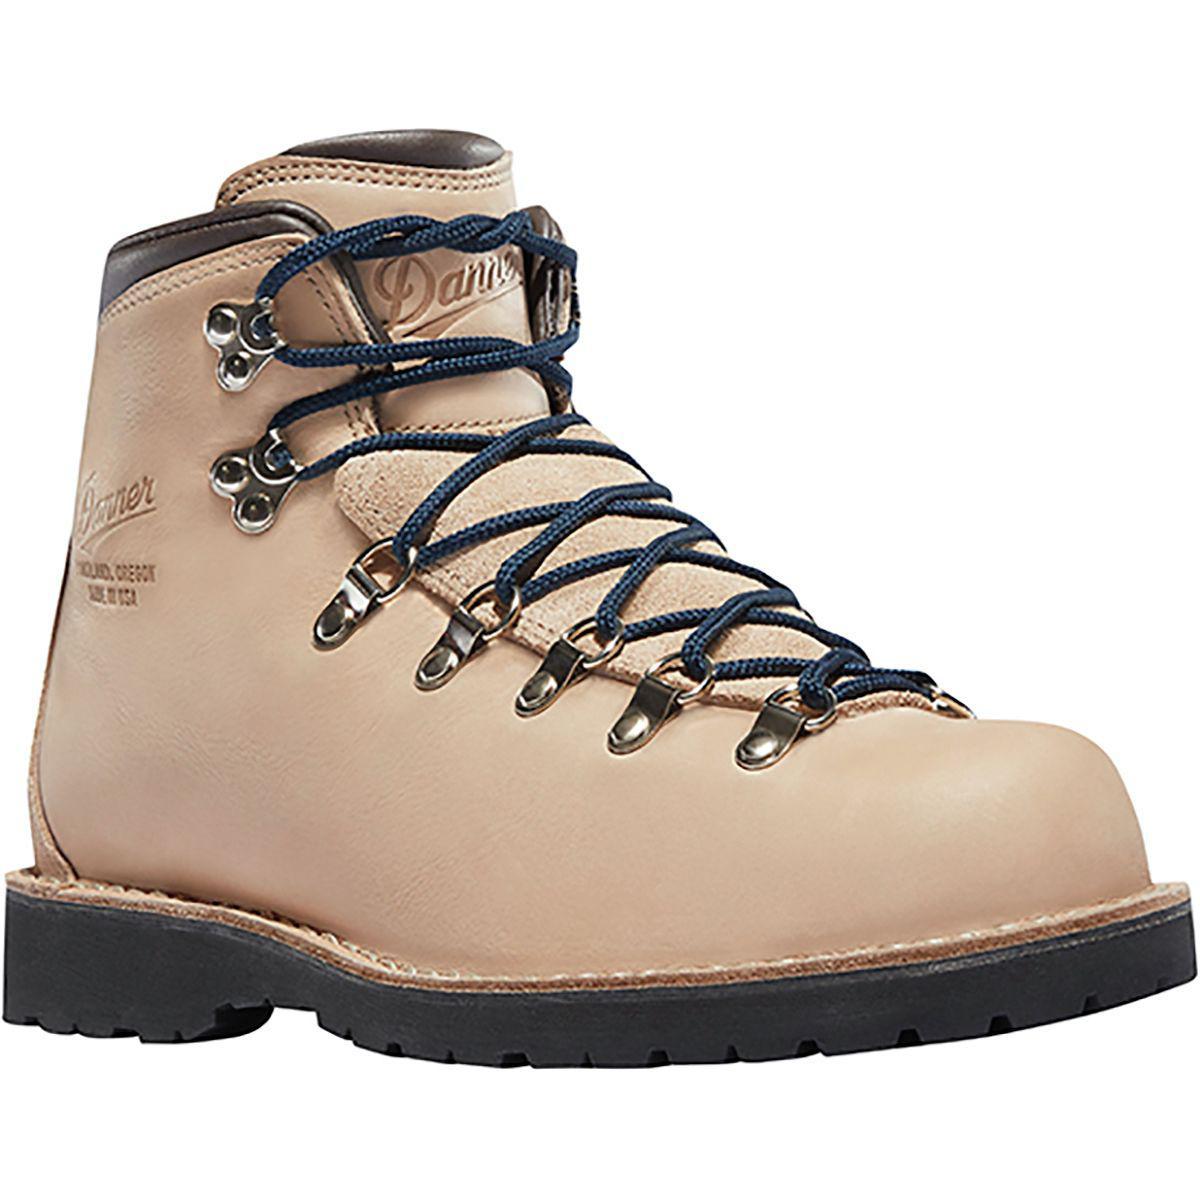 5abe8d9e7 Danner - Multicolor Portland Select Mountain Pass Gtx Boot - Lyst. View  fullscreen